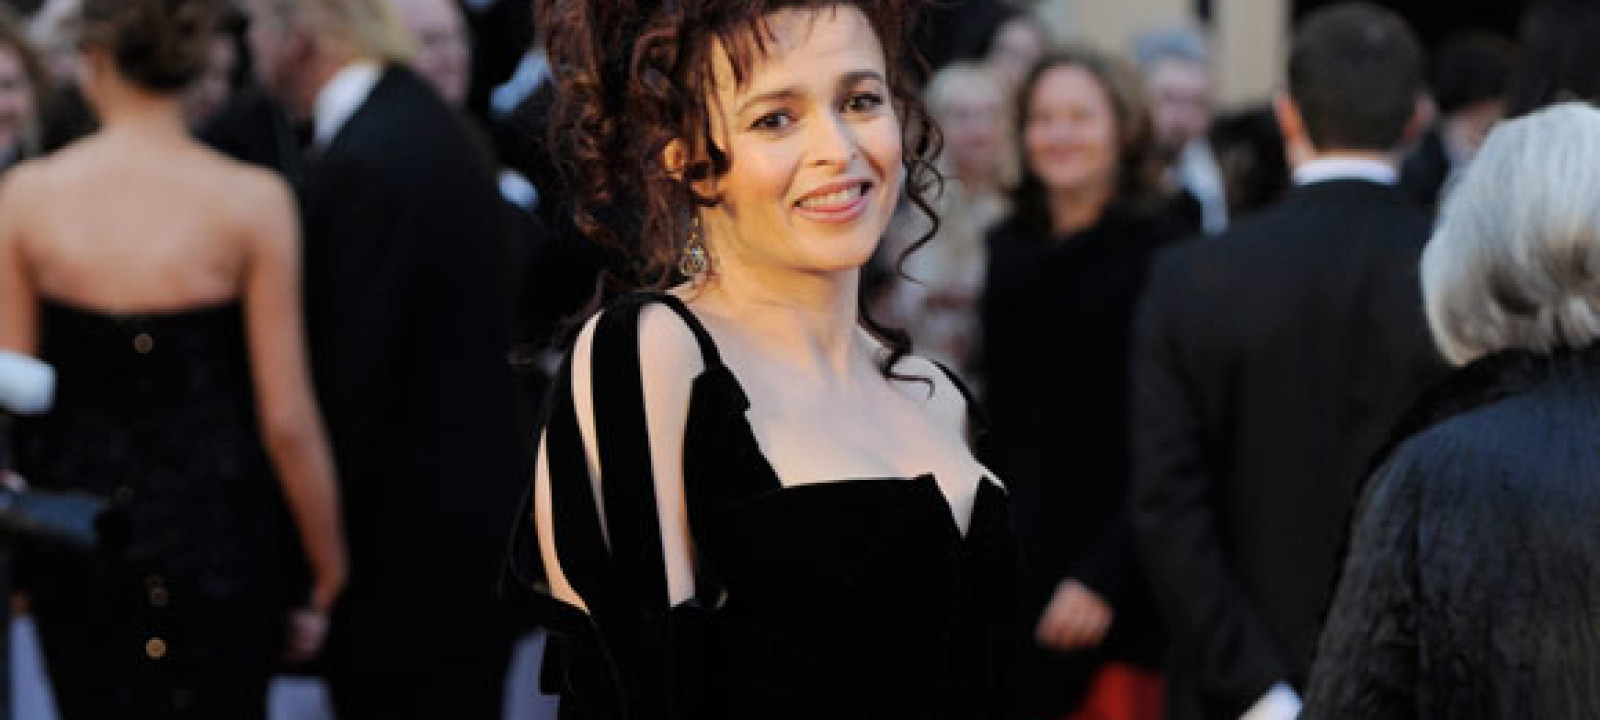 2011: Helena Bonham Carter at the Oscars